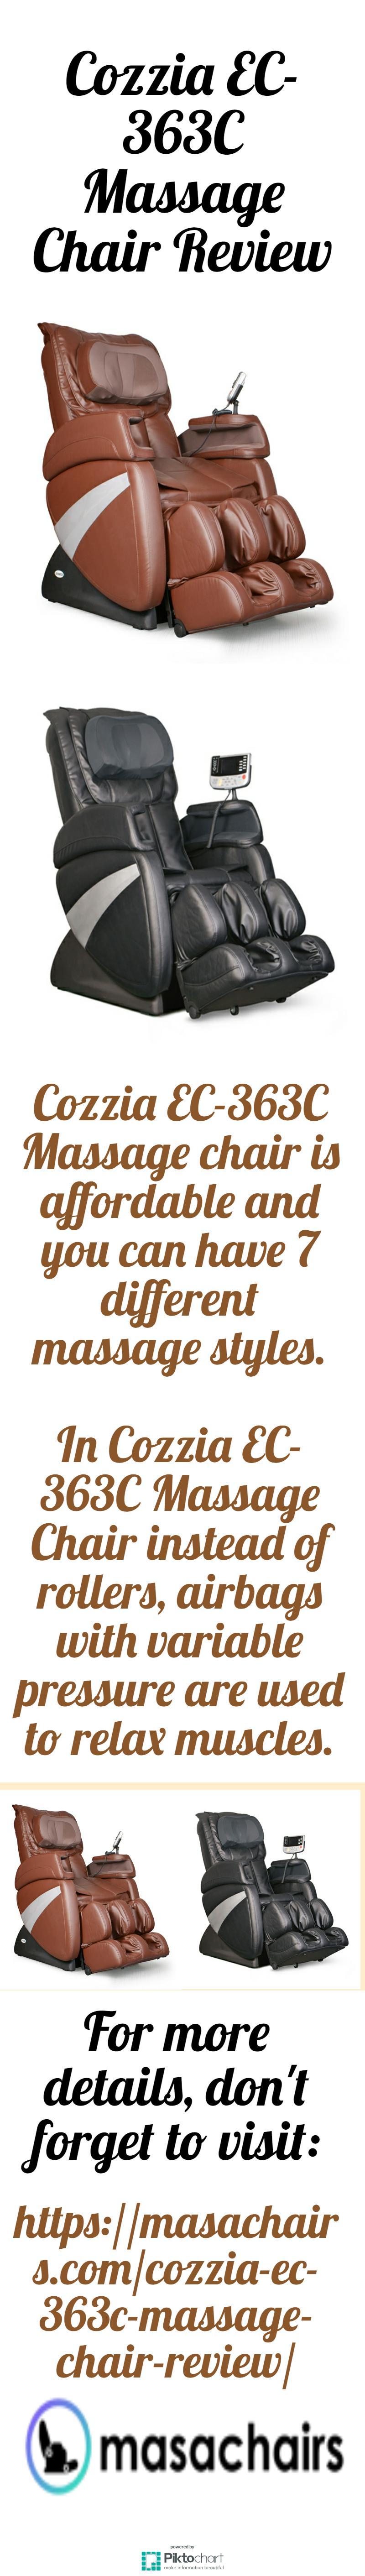 Pin On Cozzia Ec 363c Massage Chair Review